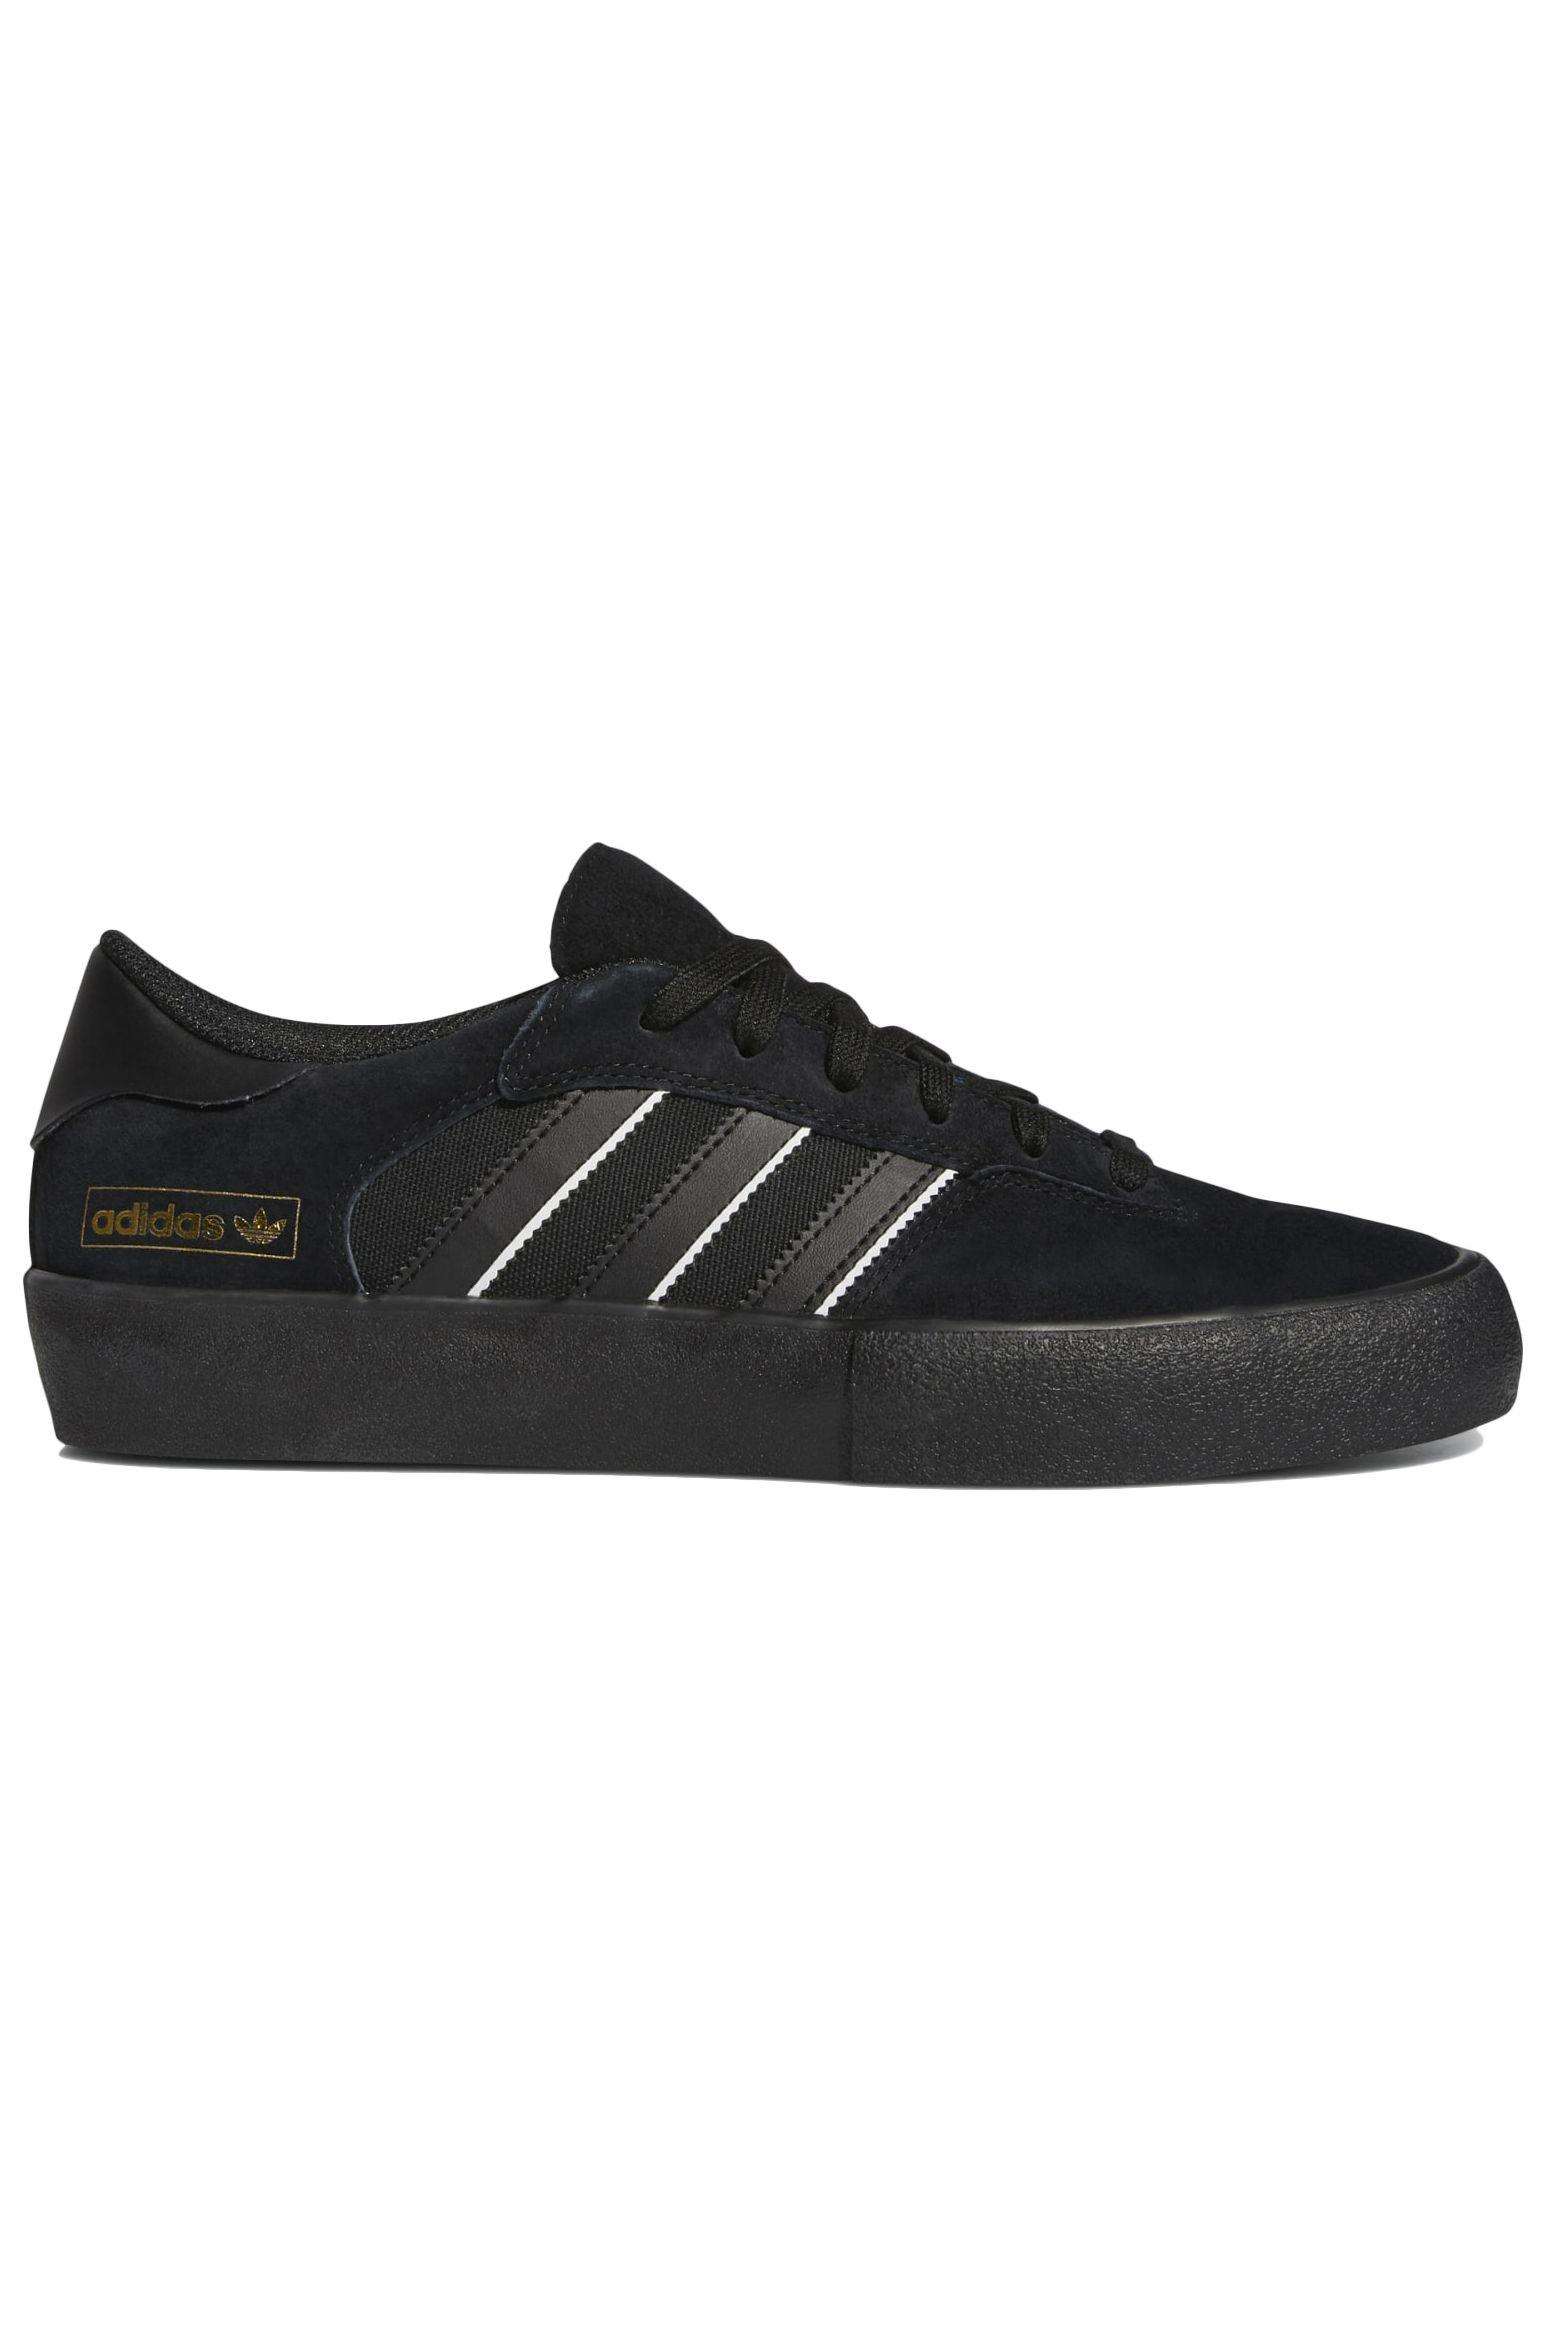 Adidas Shoes MATCHBREAK SUPER Cblack/Ftwwht/Gum5